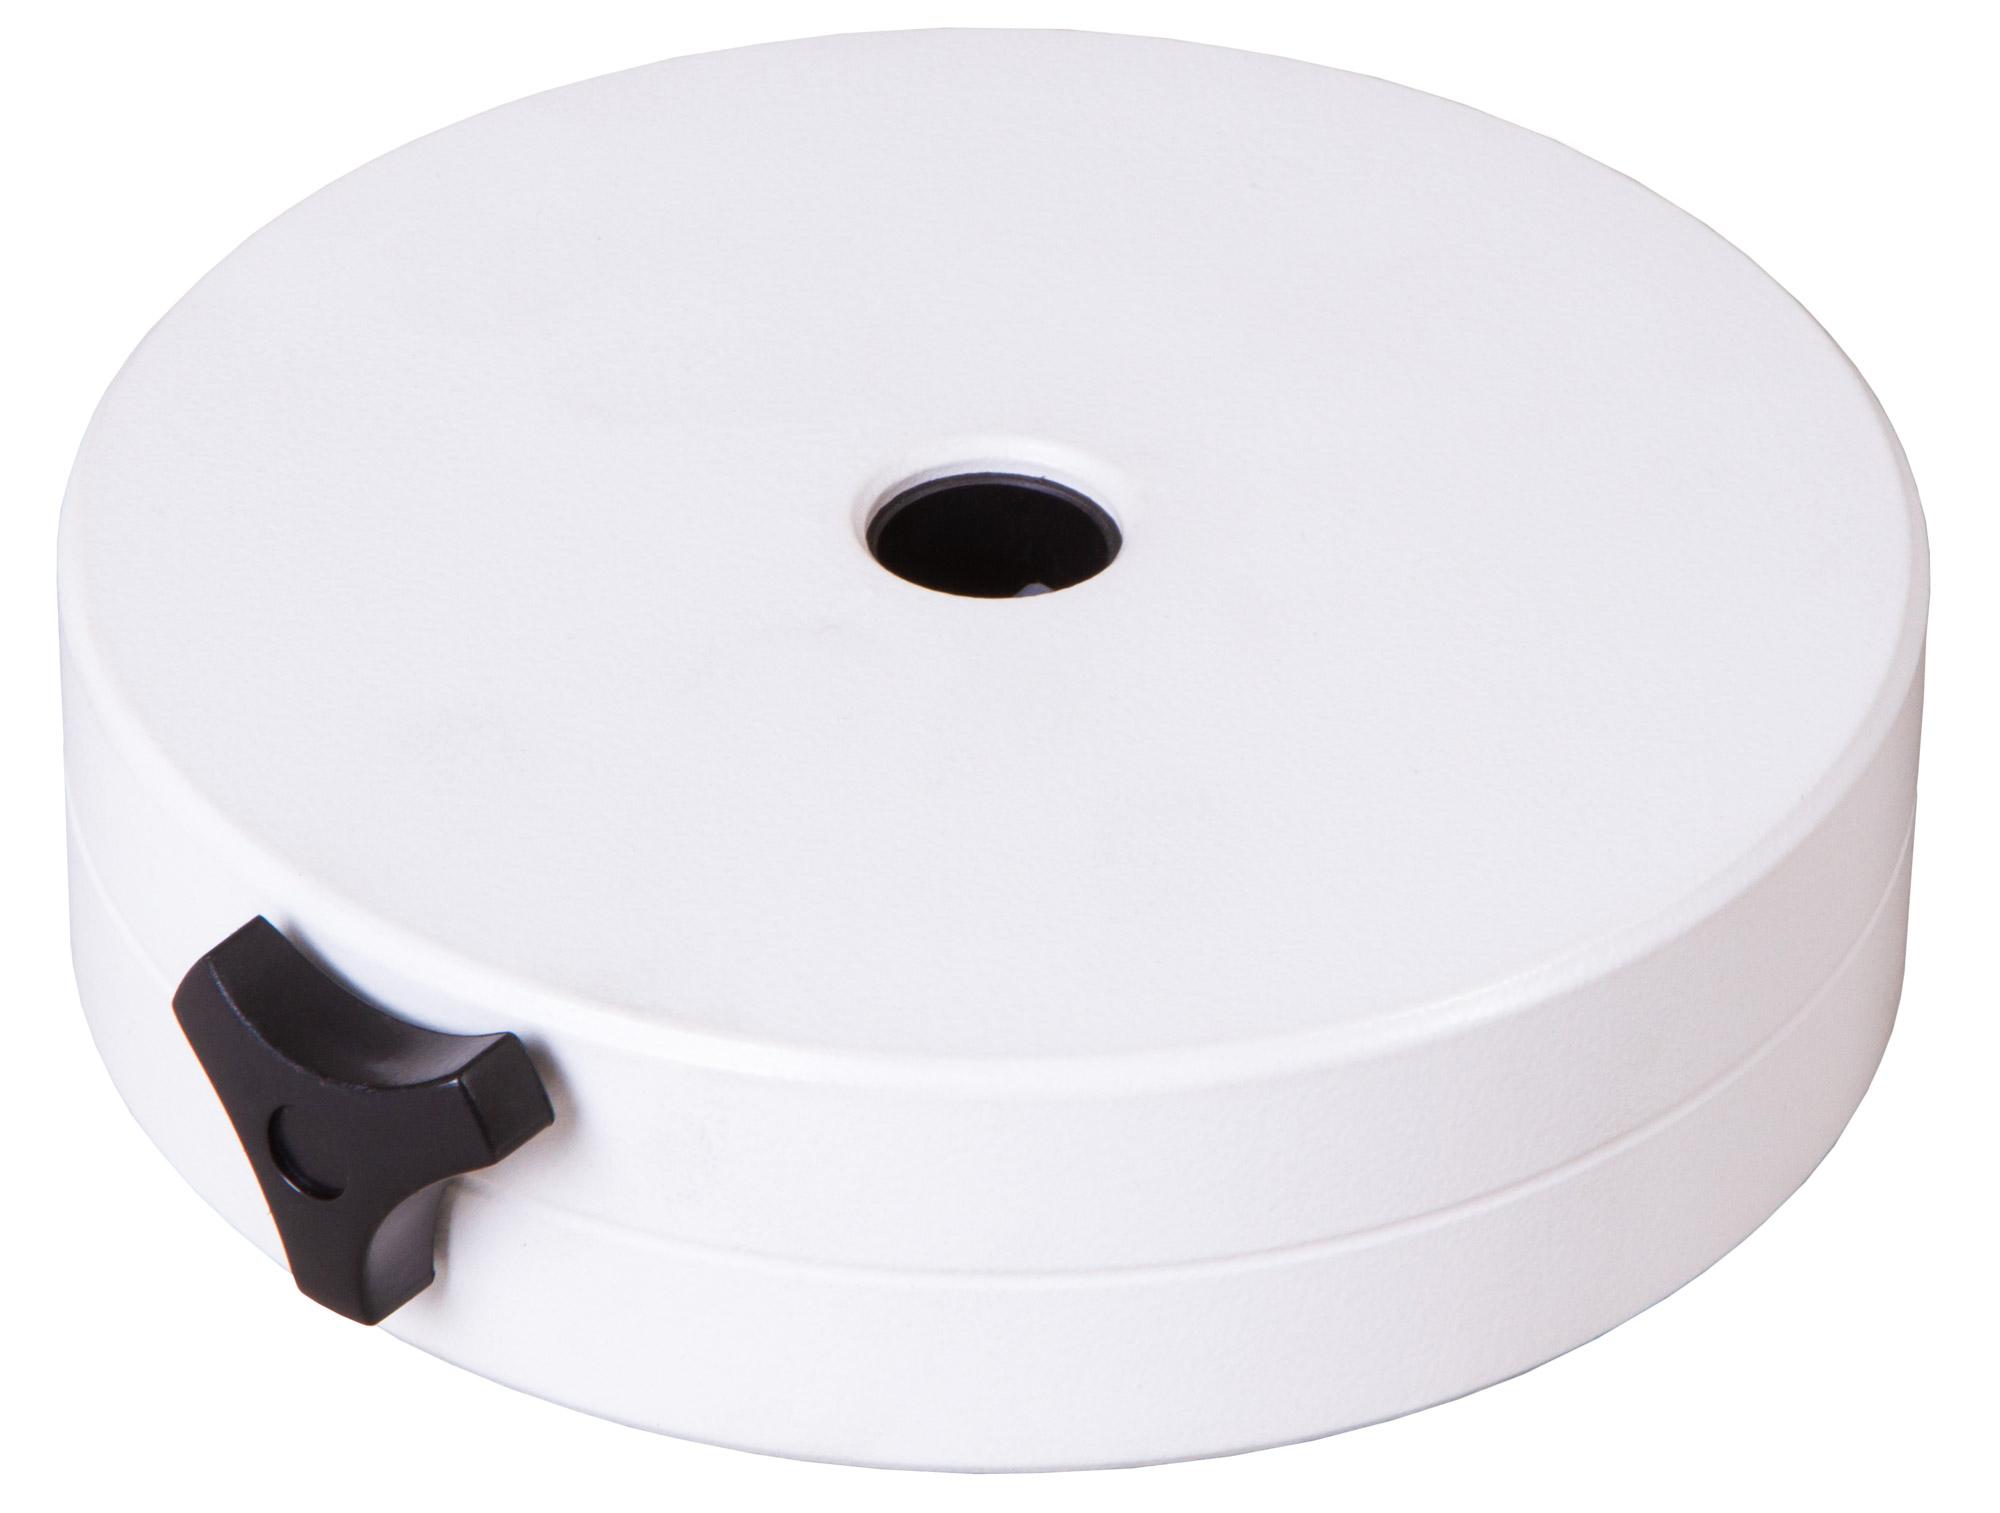 Картинка для Противовес Sky-Watcher для монтировки EQ6/HEQ5, 5,1 кг